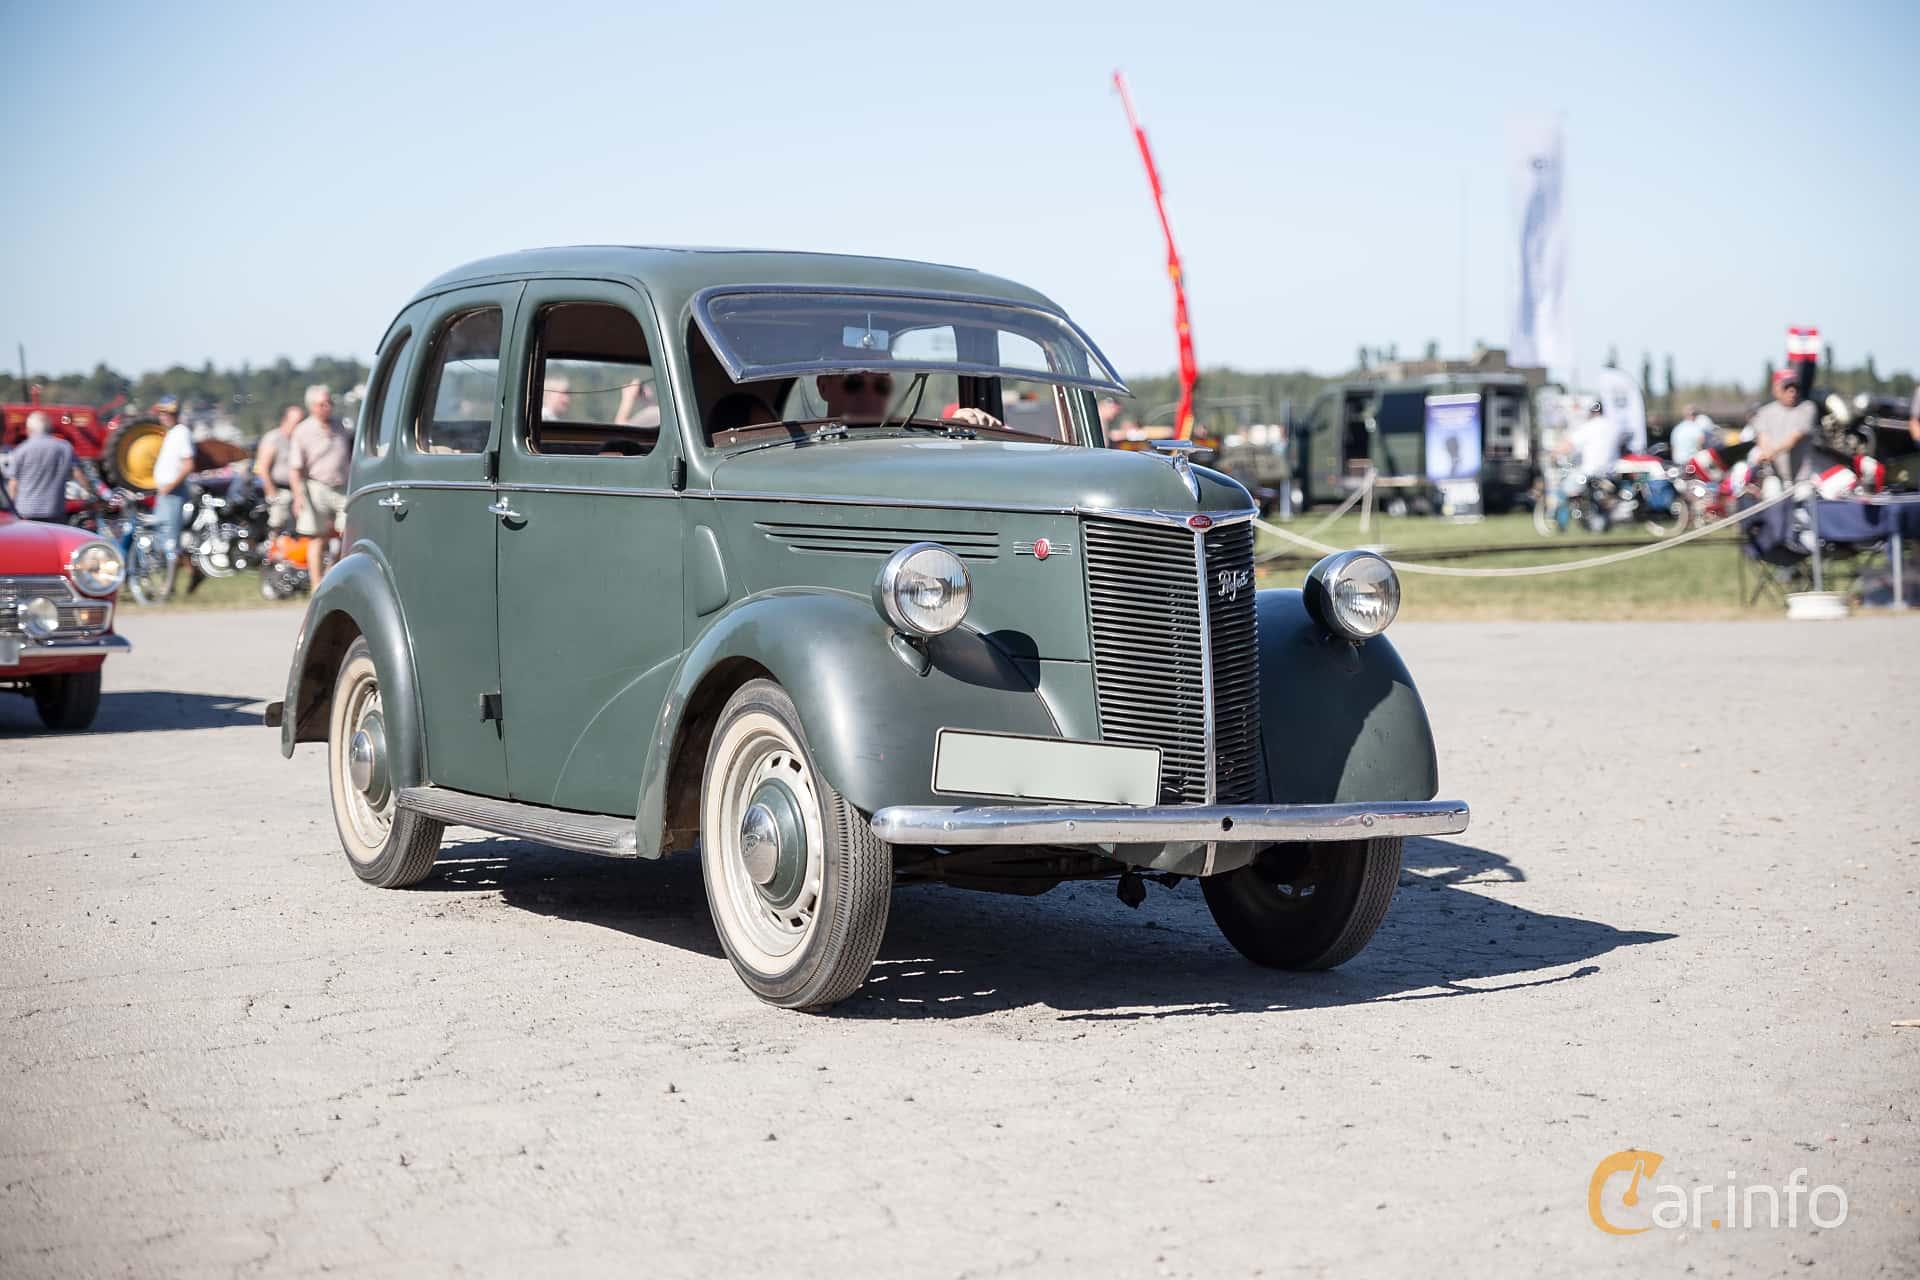 Front/Side  of Ford Prefect 1.2 Manual, 30ps, 1939 at Eskilstunas Veterandag 2015